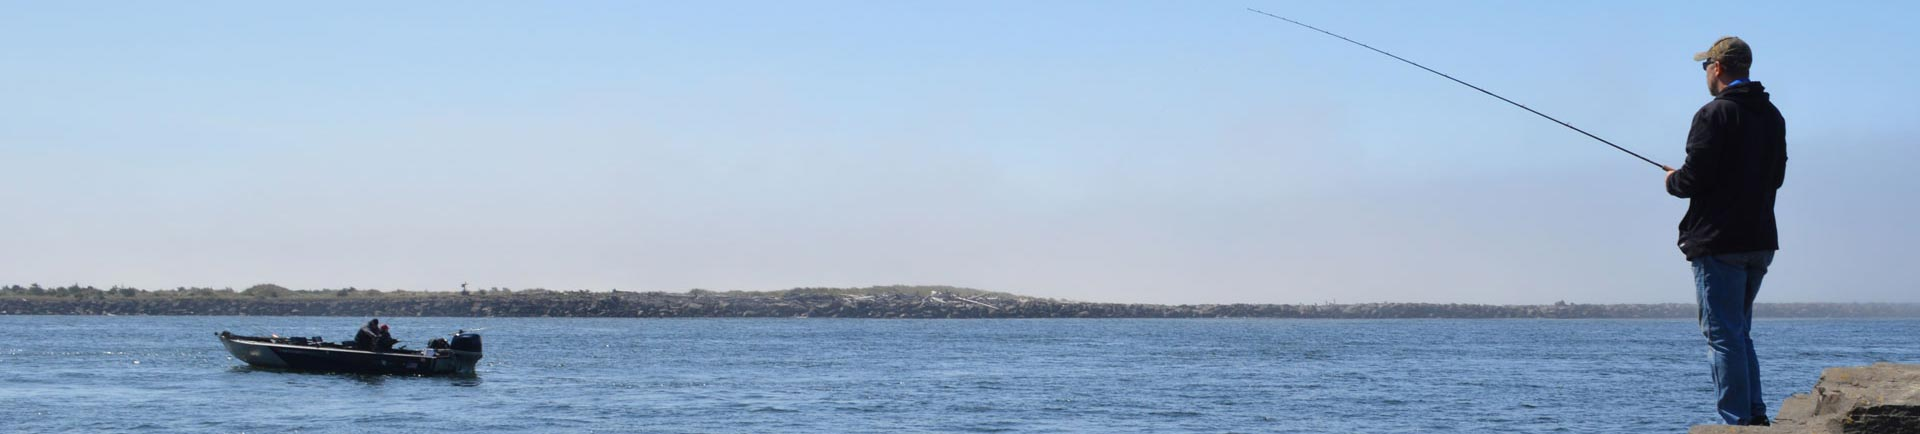 River bay deep sea fishing on oregon coast tillamook for Deep sea fishing oregon coast